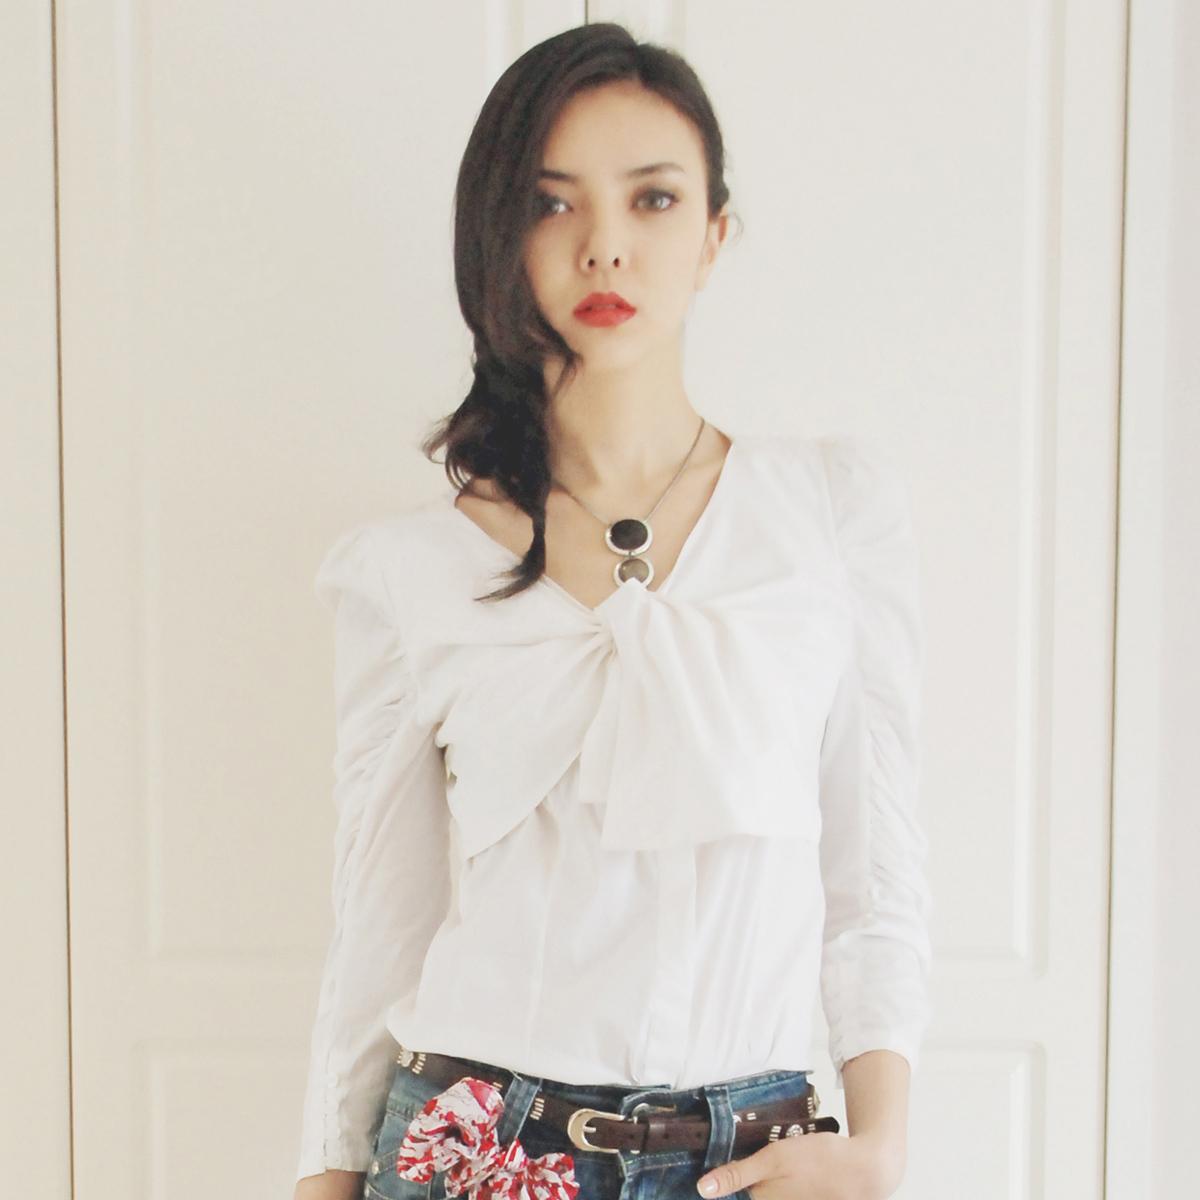 женская рубашка MATCHE mk111045